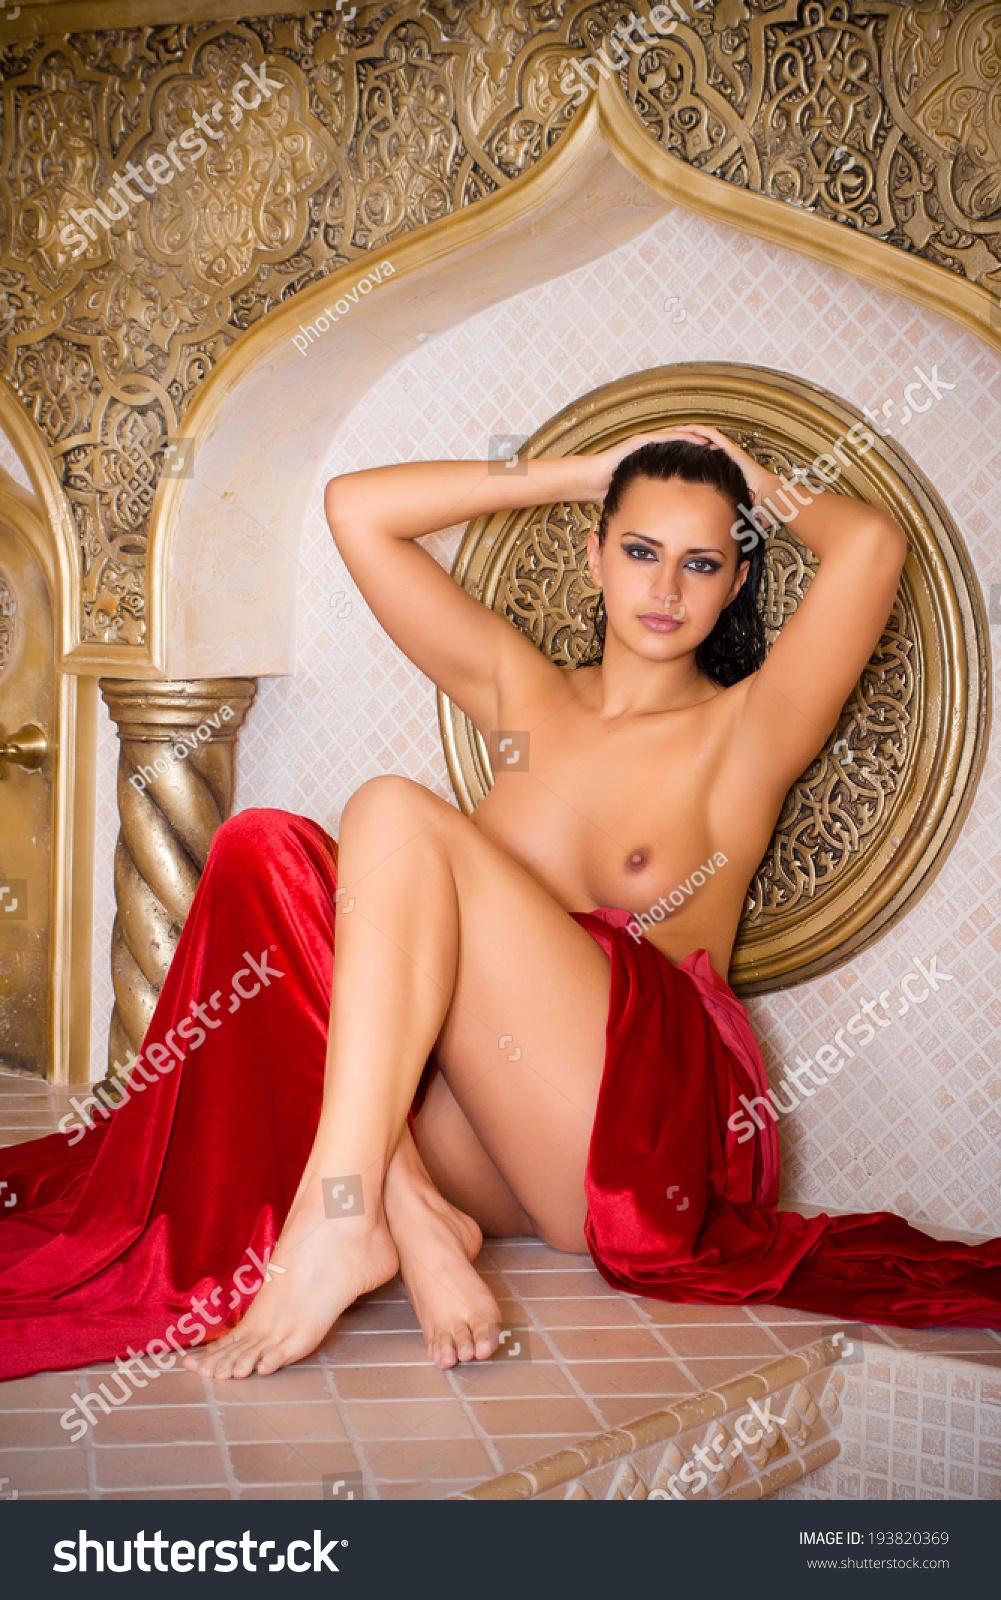 Turki grils wallpeper naked